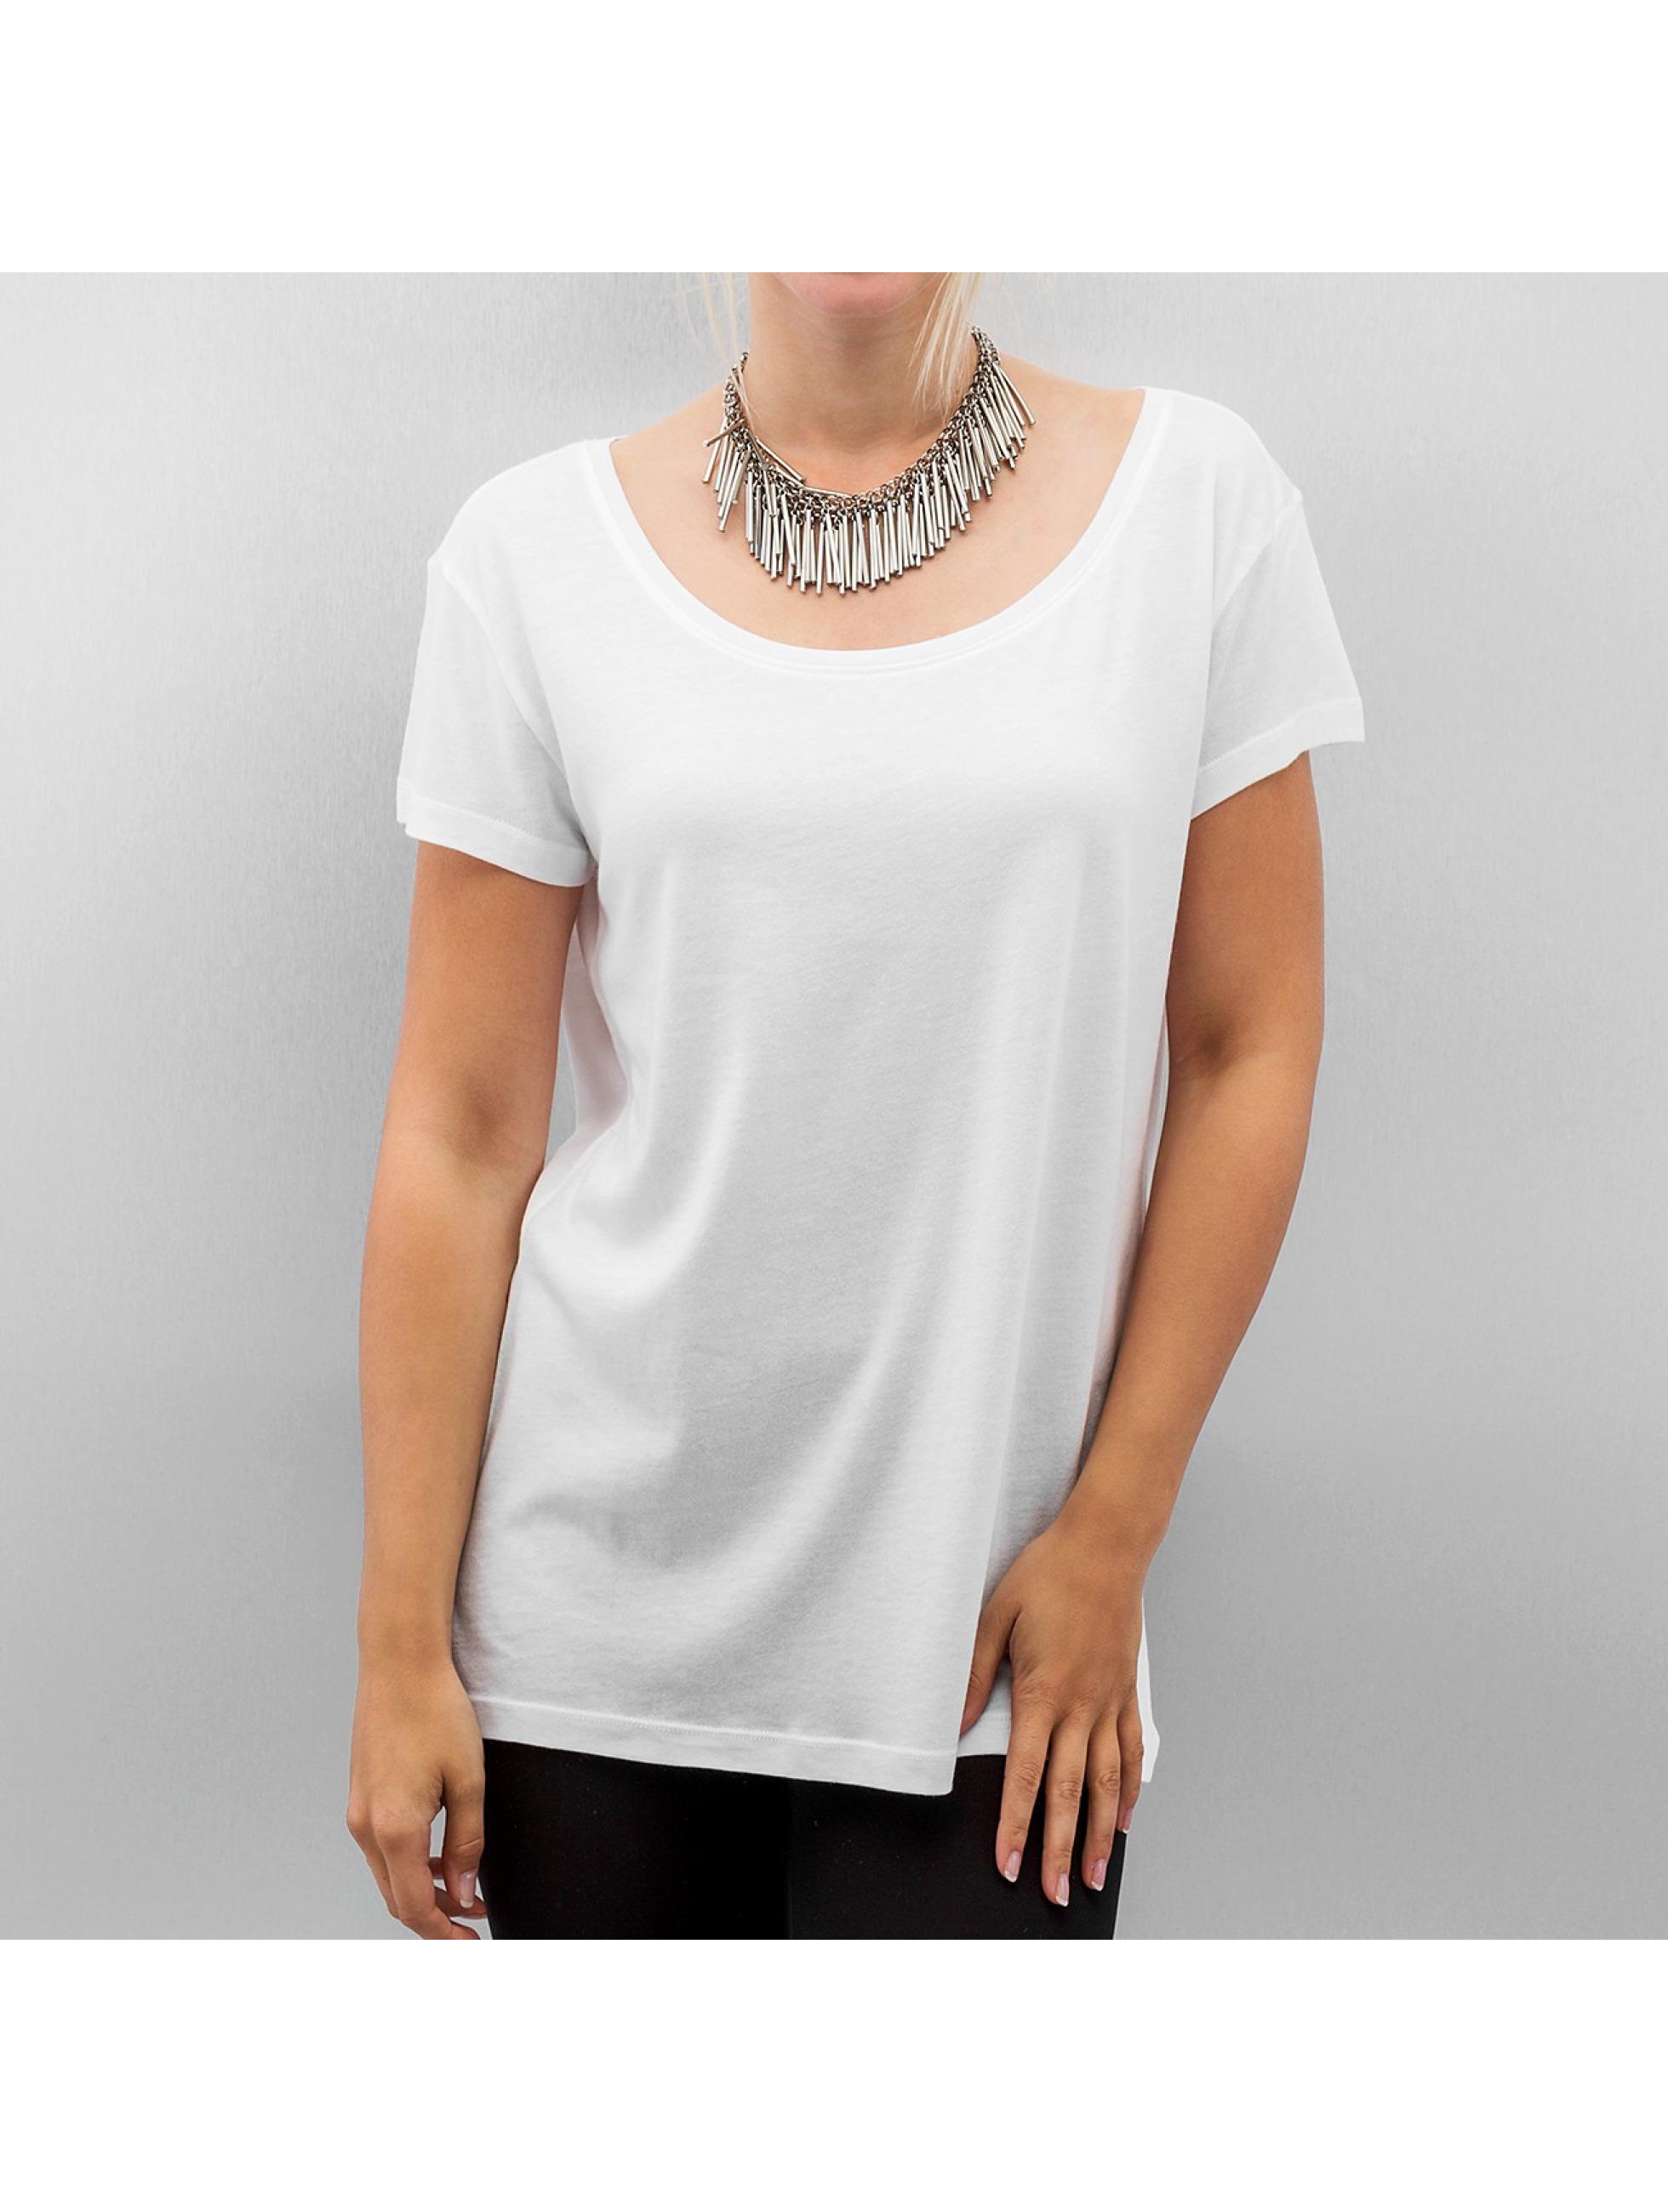 Pieces Haut / T-Shirt Emma en blanc